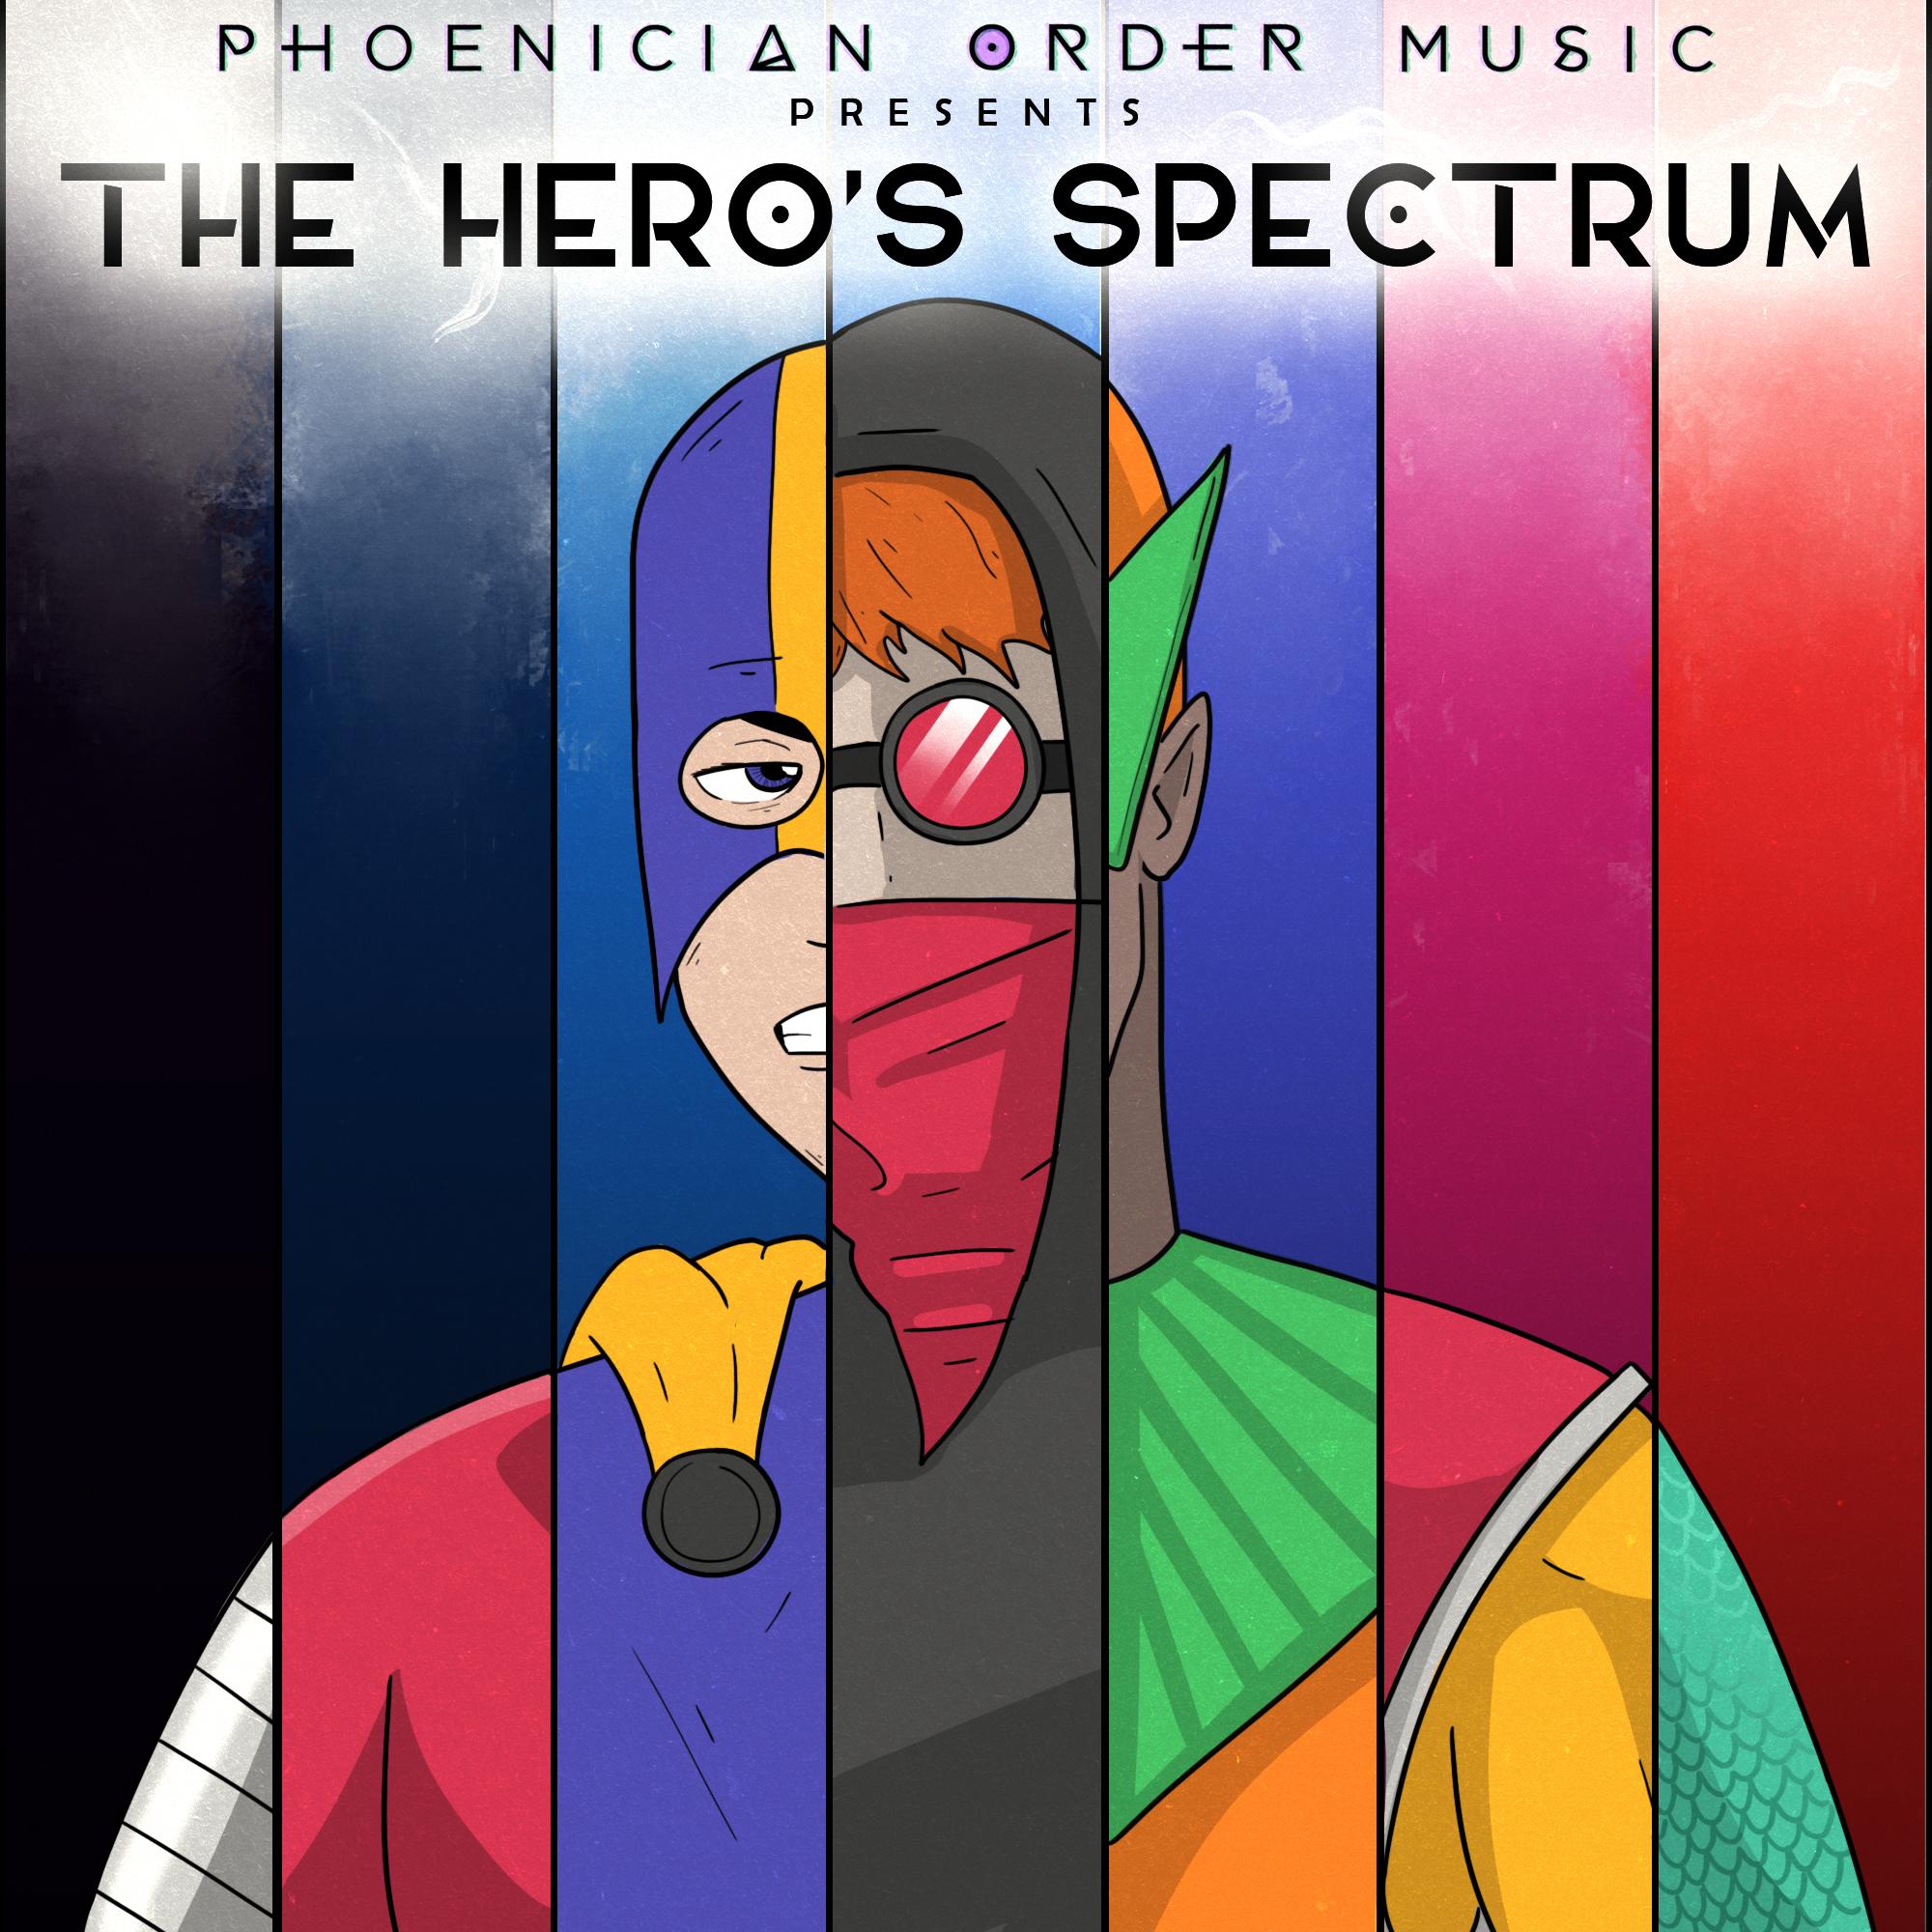 The Hero's Spectrum.jpg